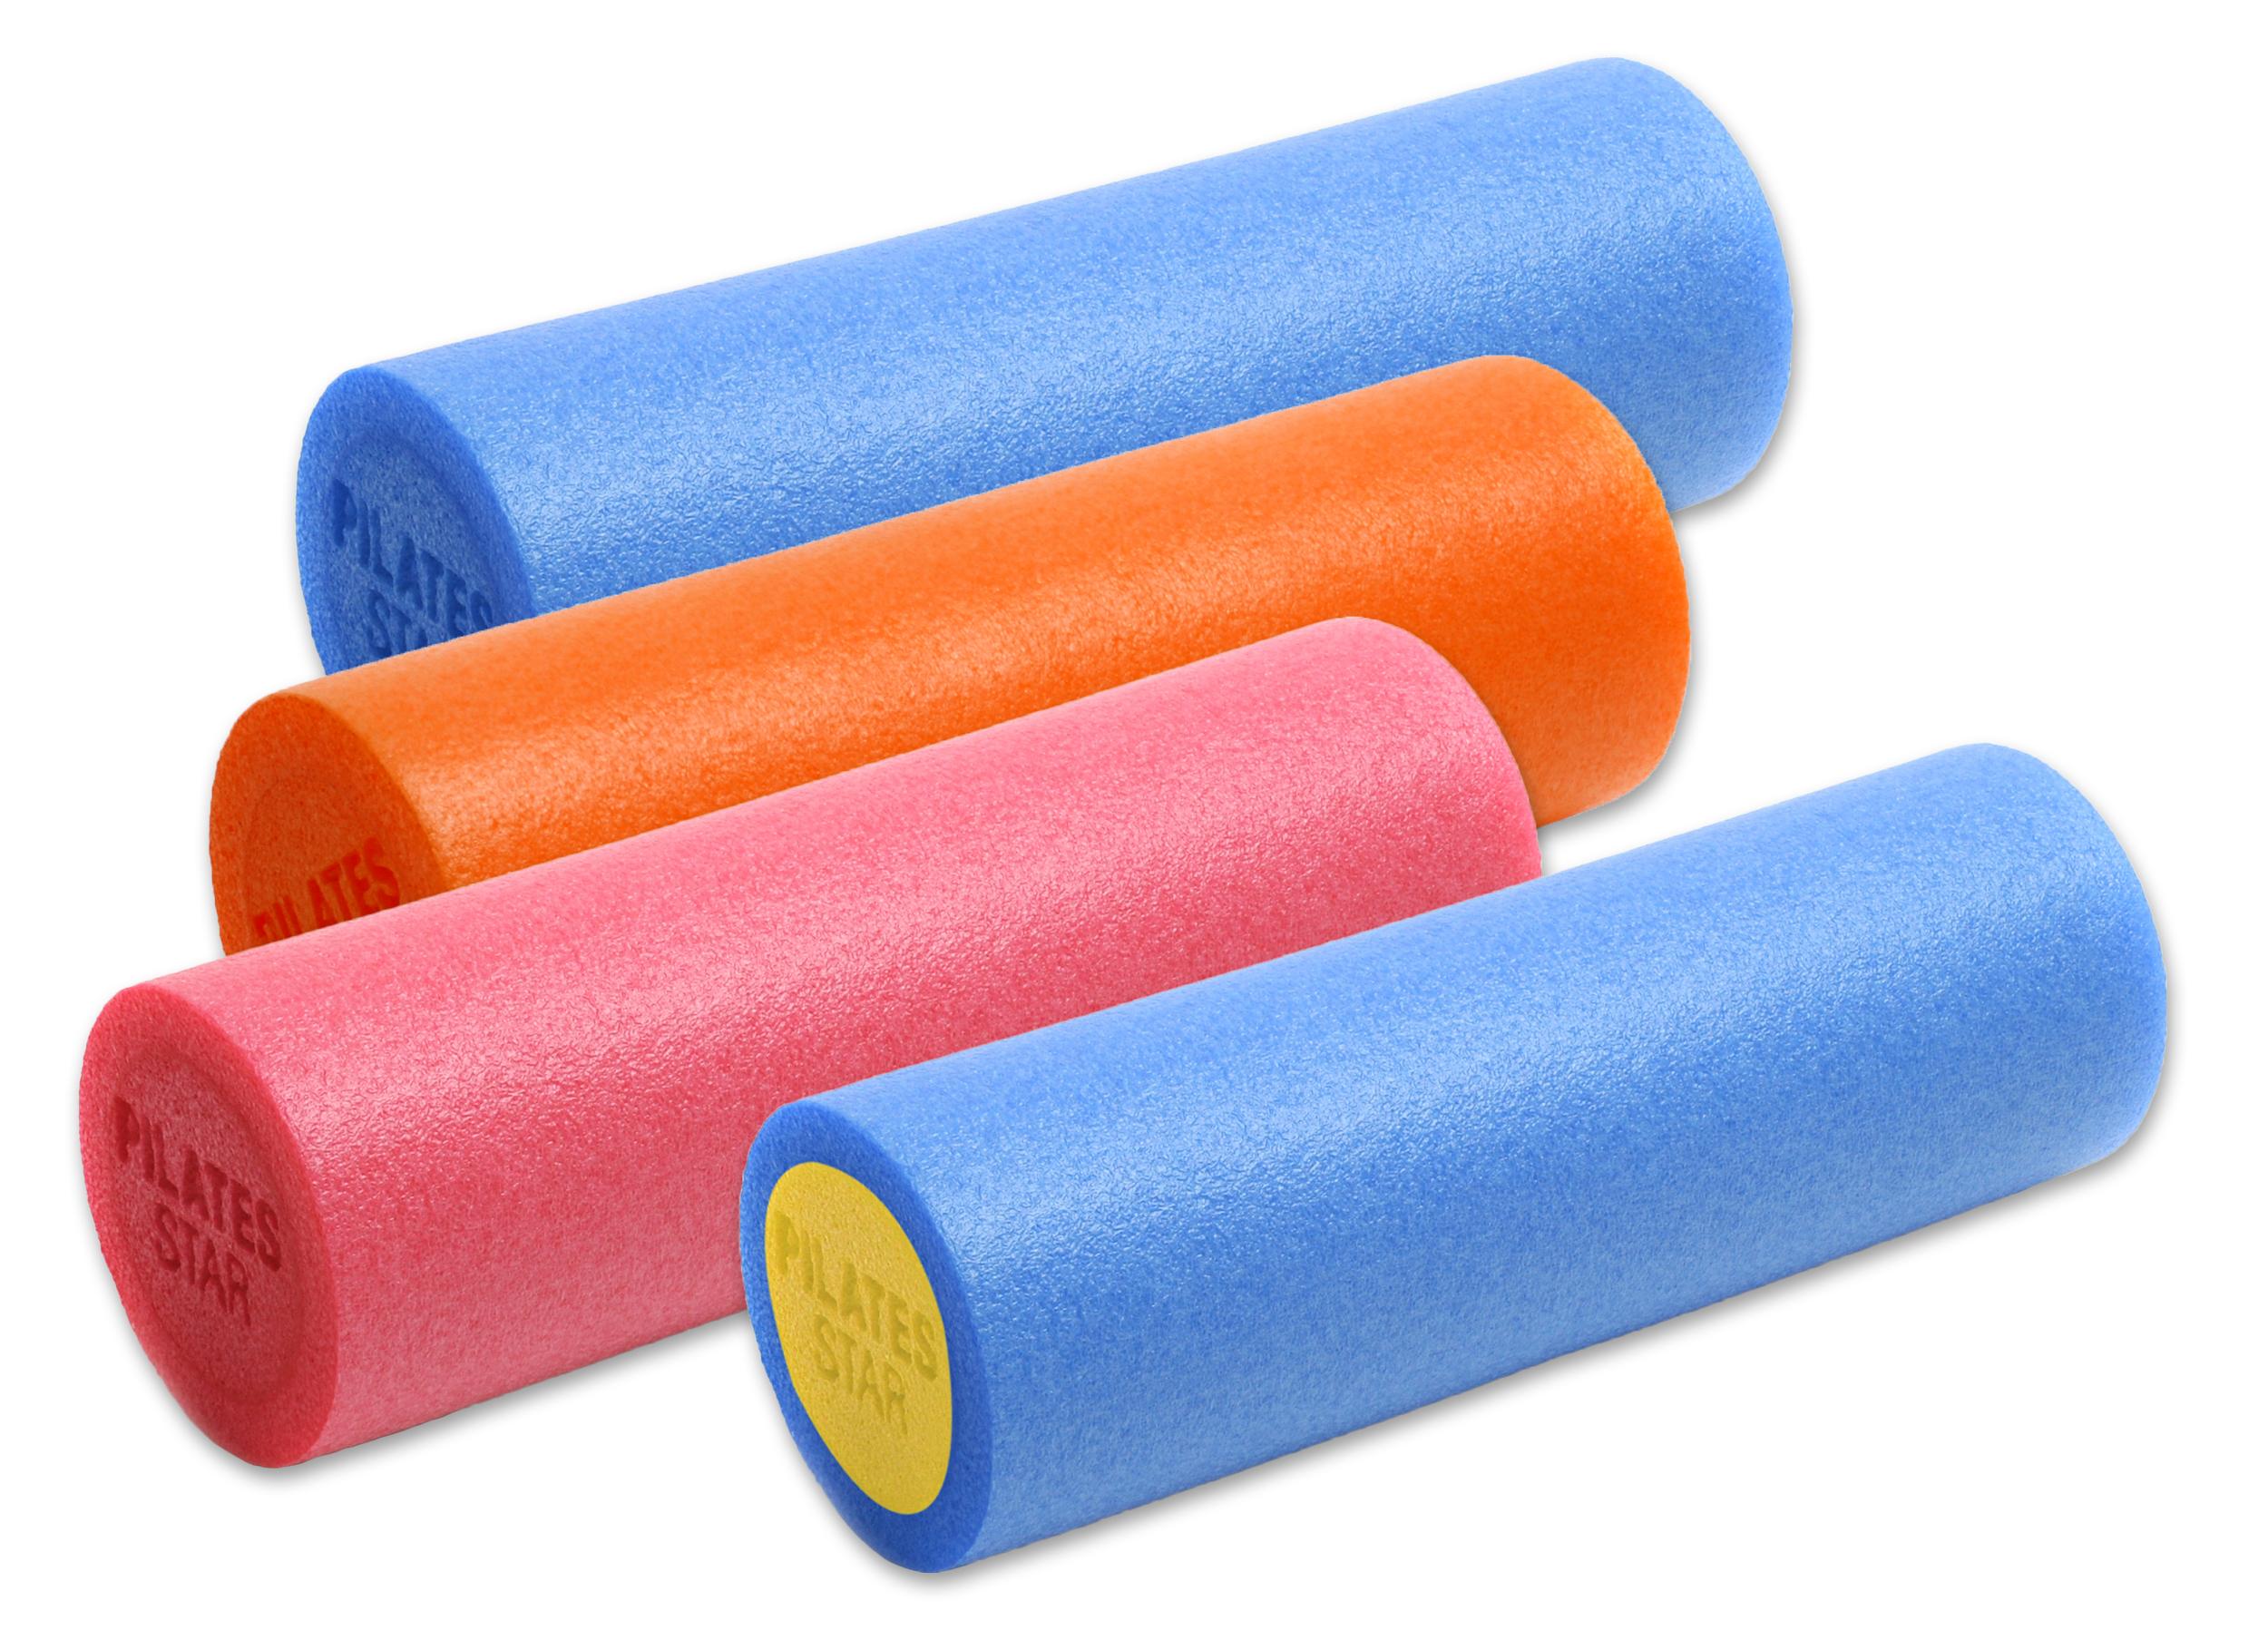 Faszienrolle / Pilatesrolle - 45cm